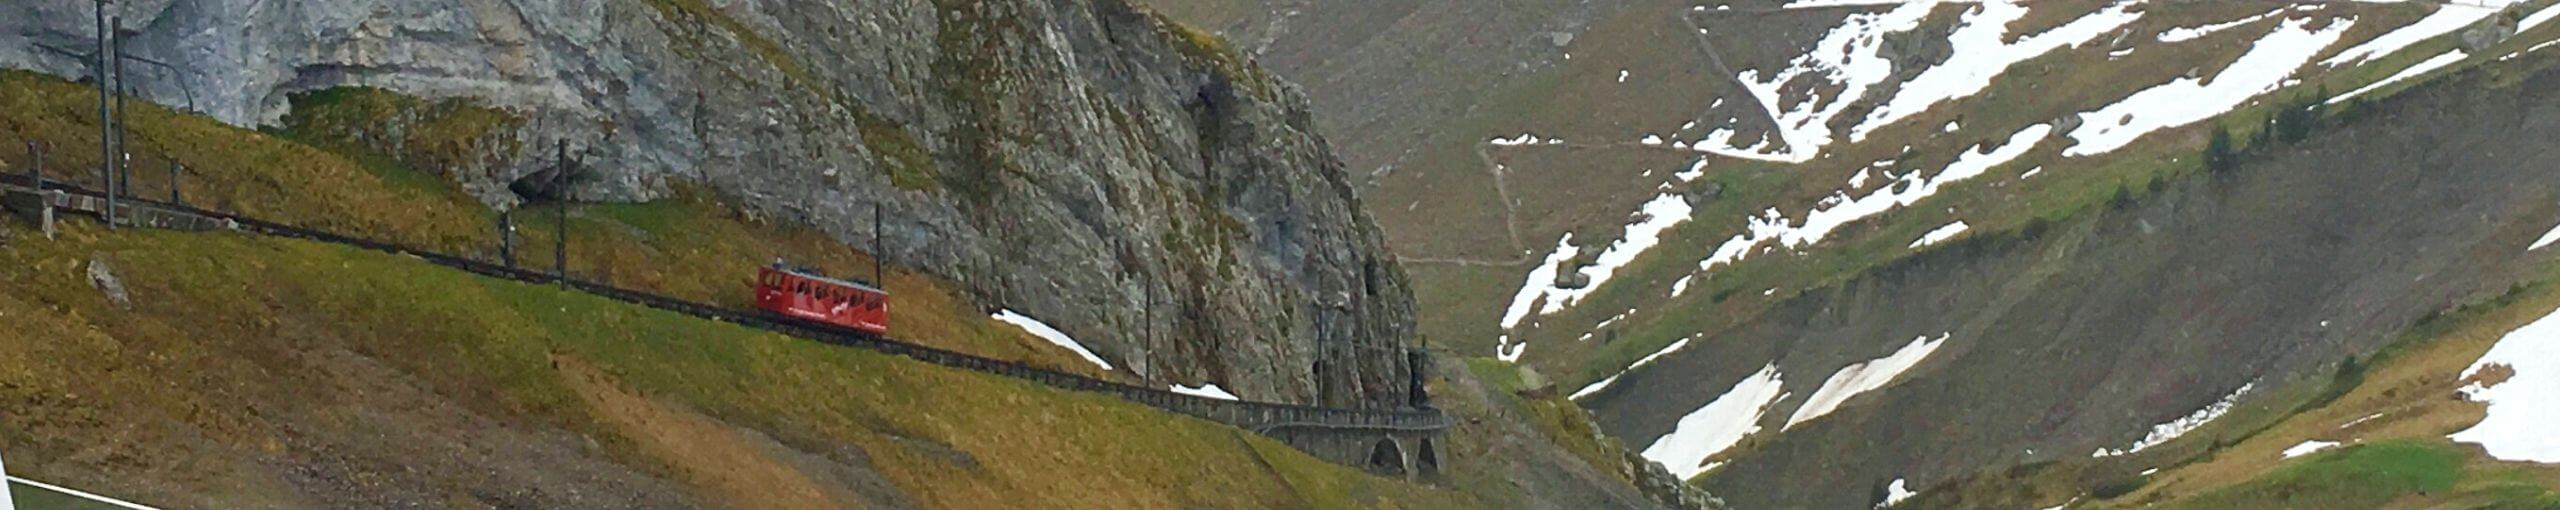 Tren de Cremallera del Monte Pilatus. Suiza.